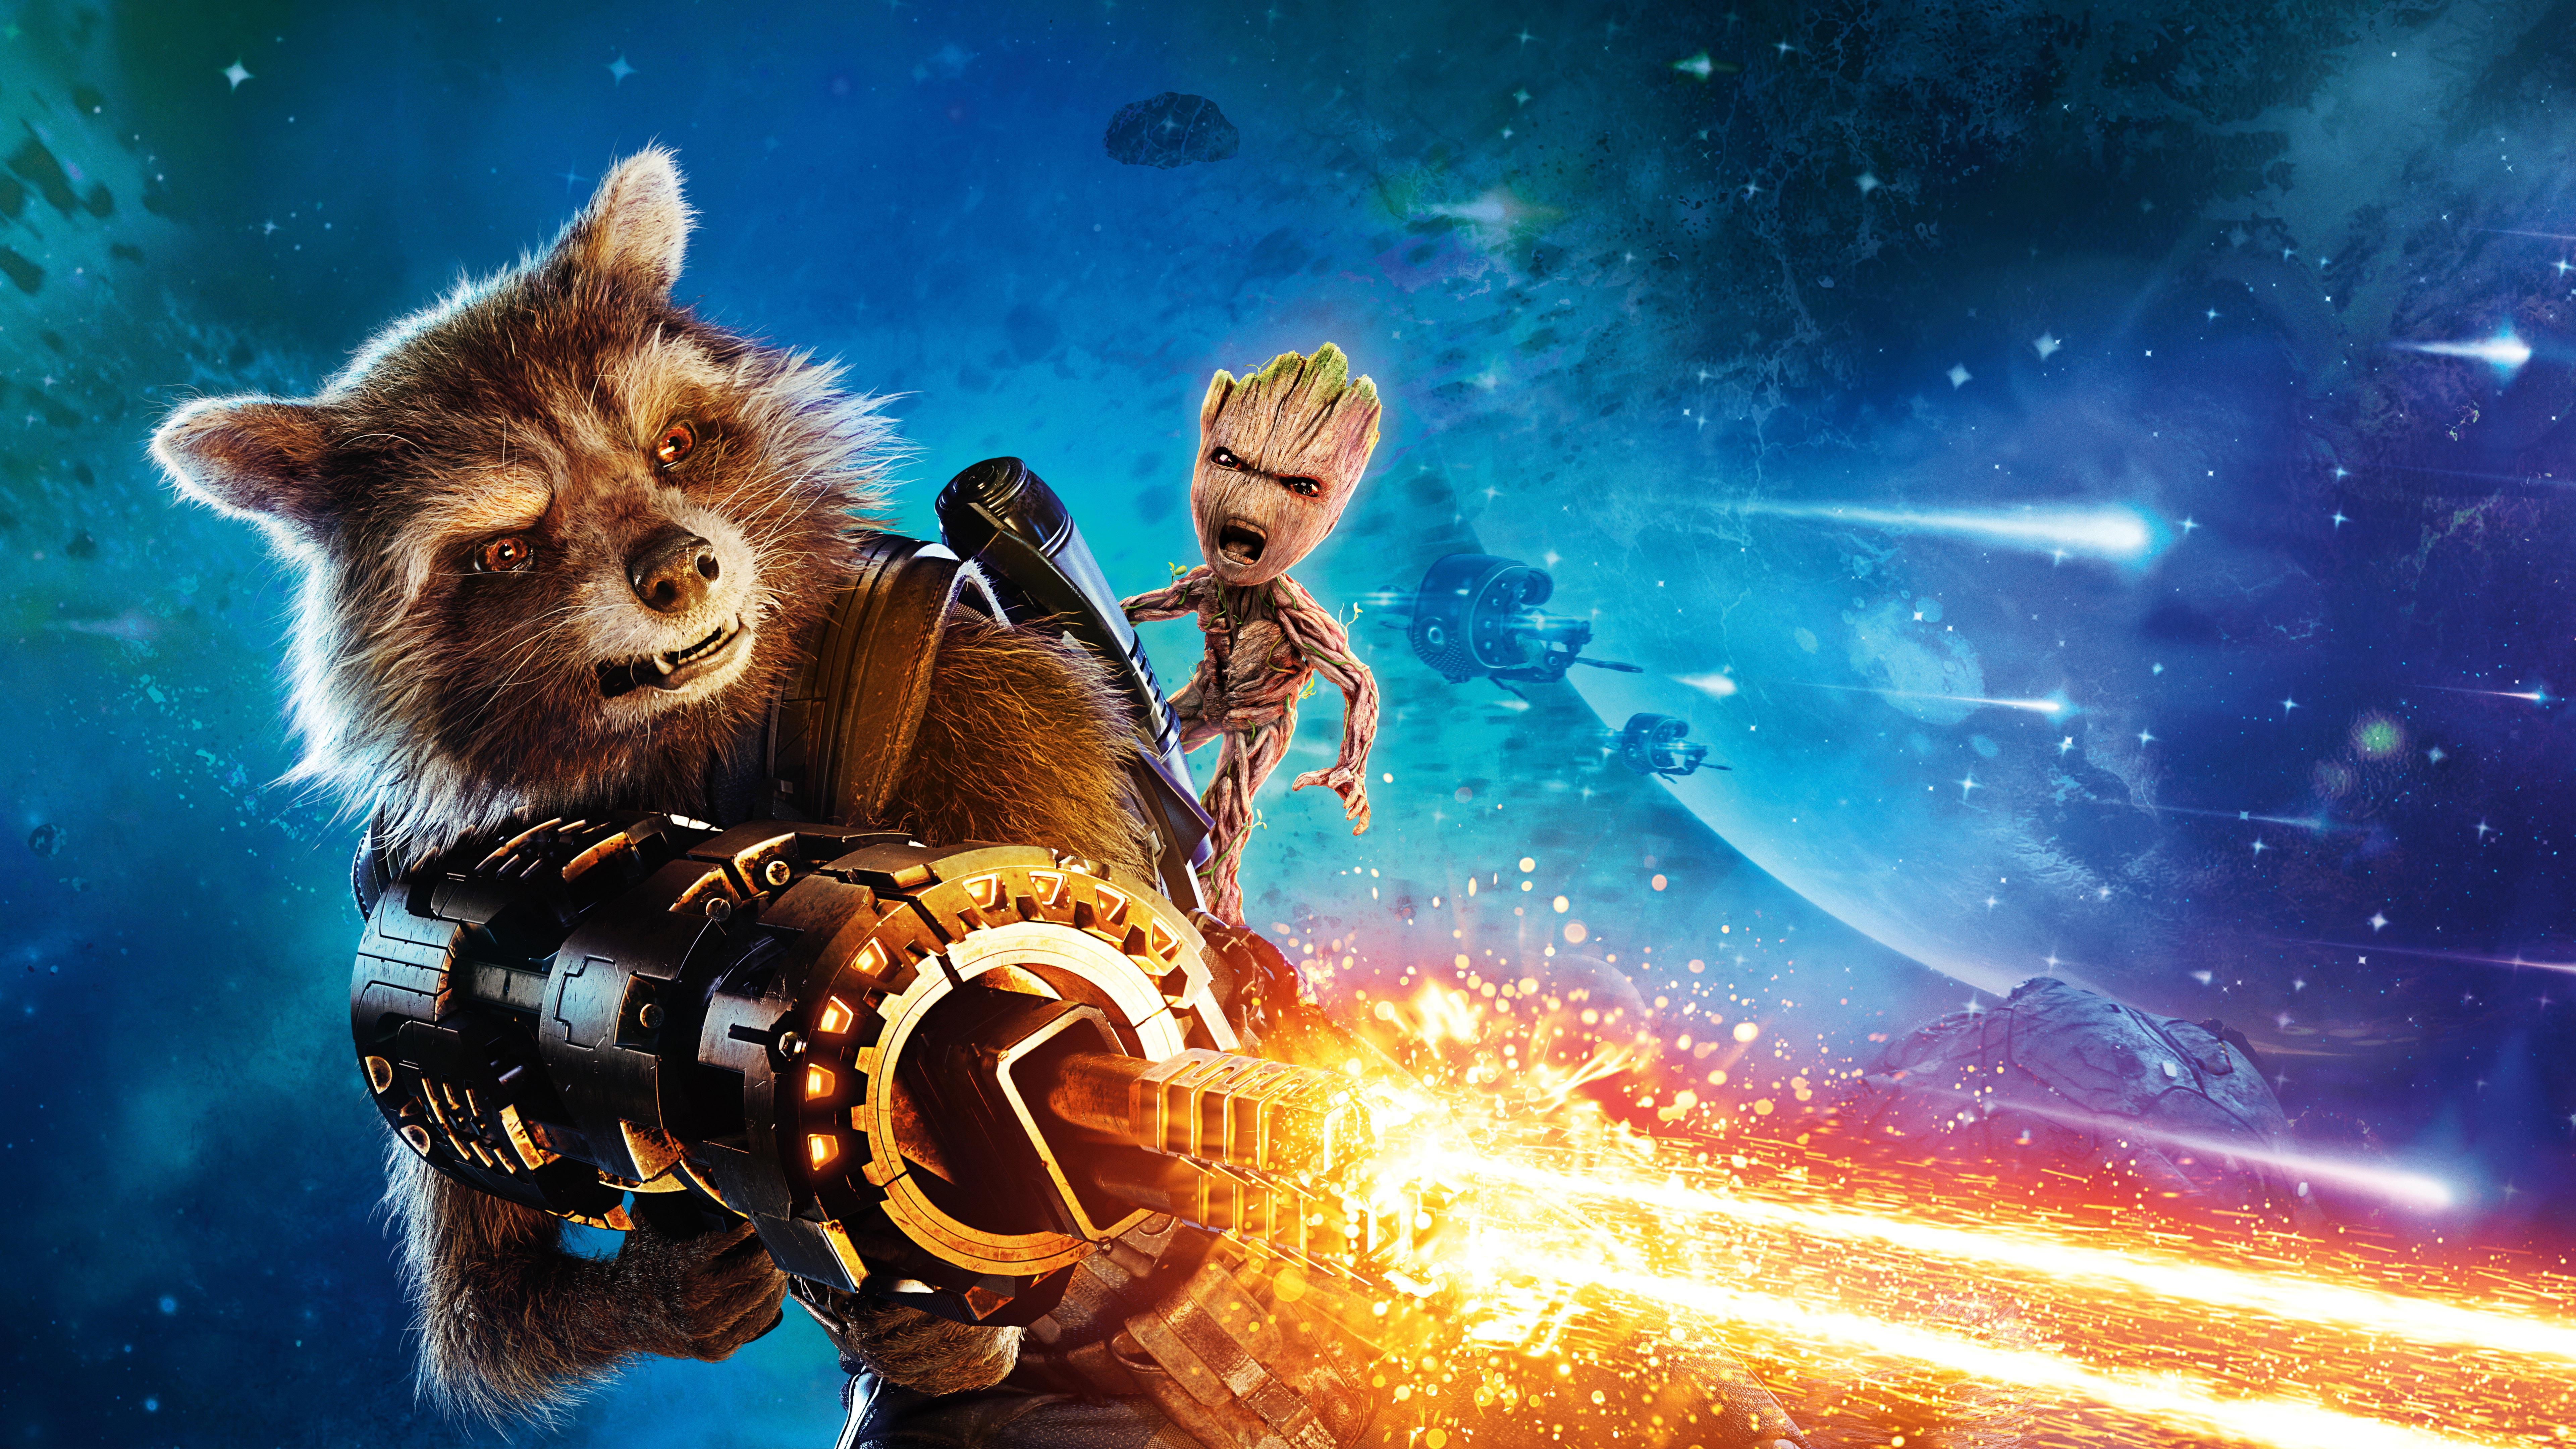 Baby Groot Guardians Of The Galaxy Vol 2 Hd Movies 4k: Baby Groot And Rocket Raccoon Guardians Of The Galaxy Vol